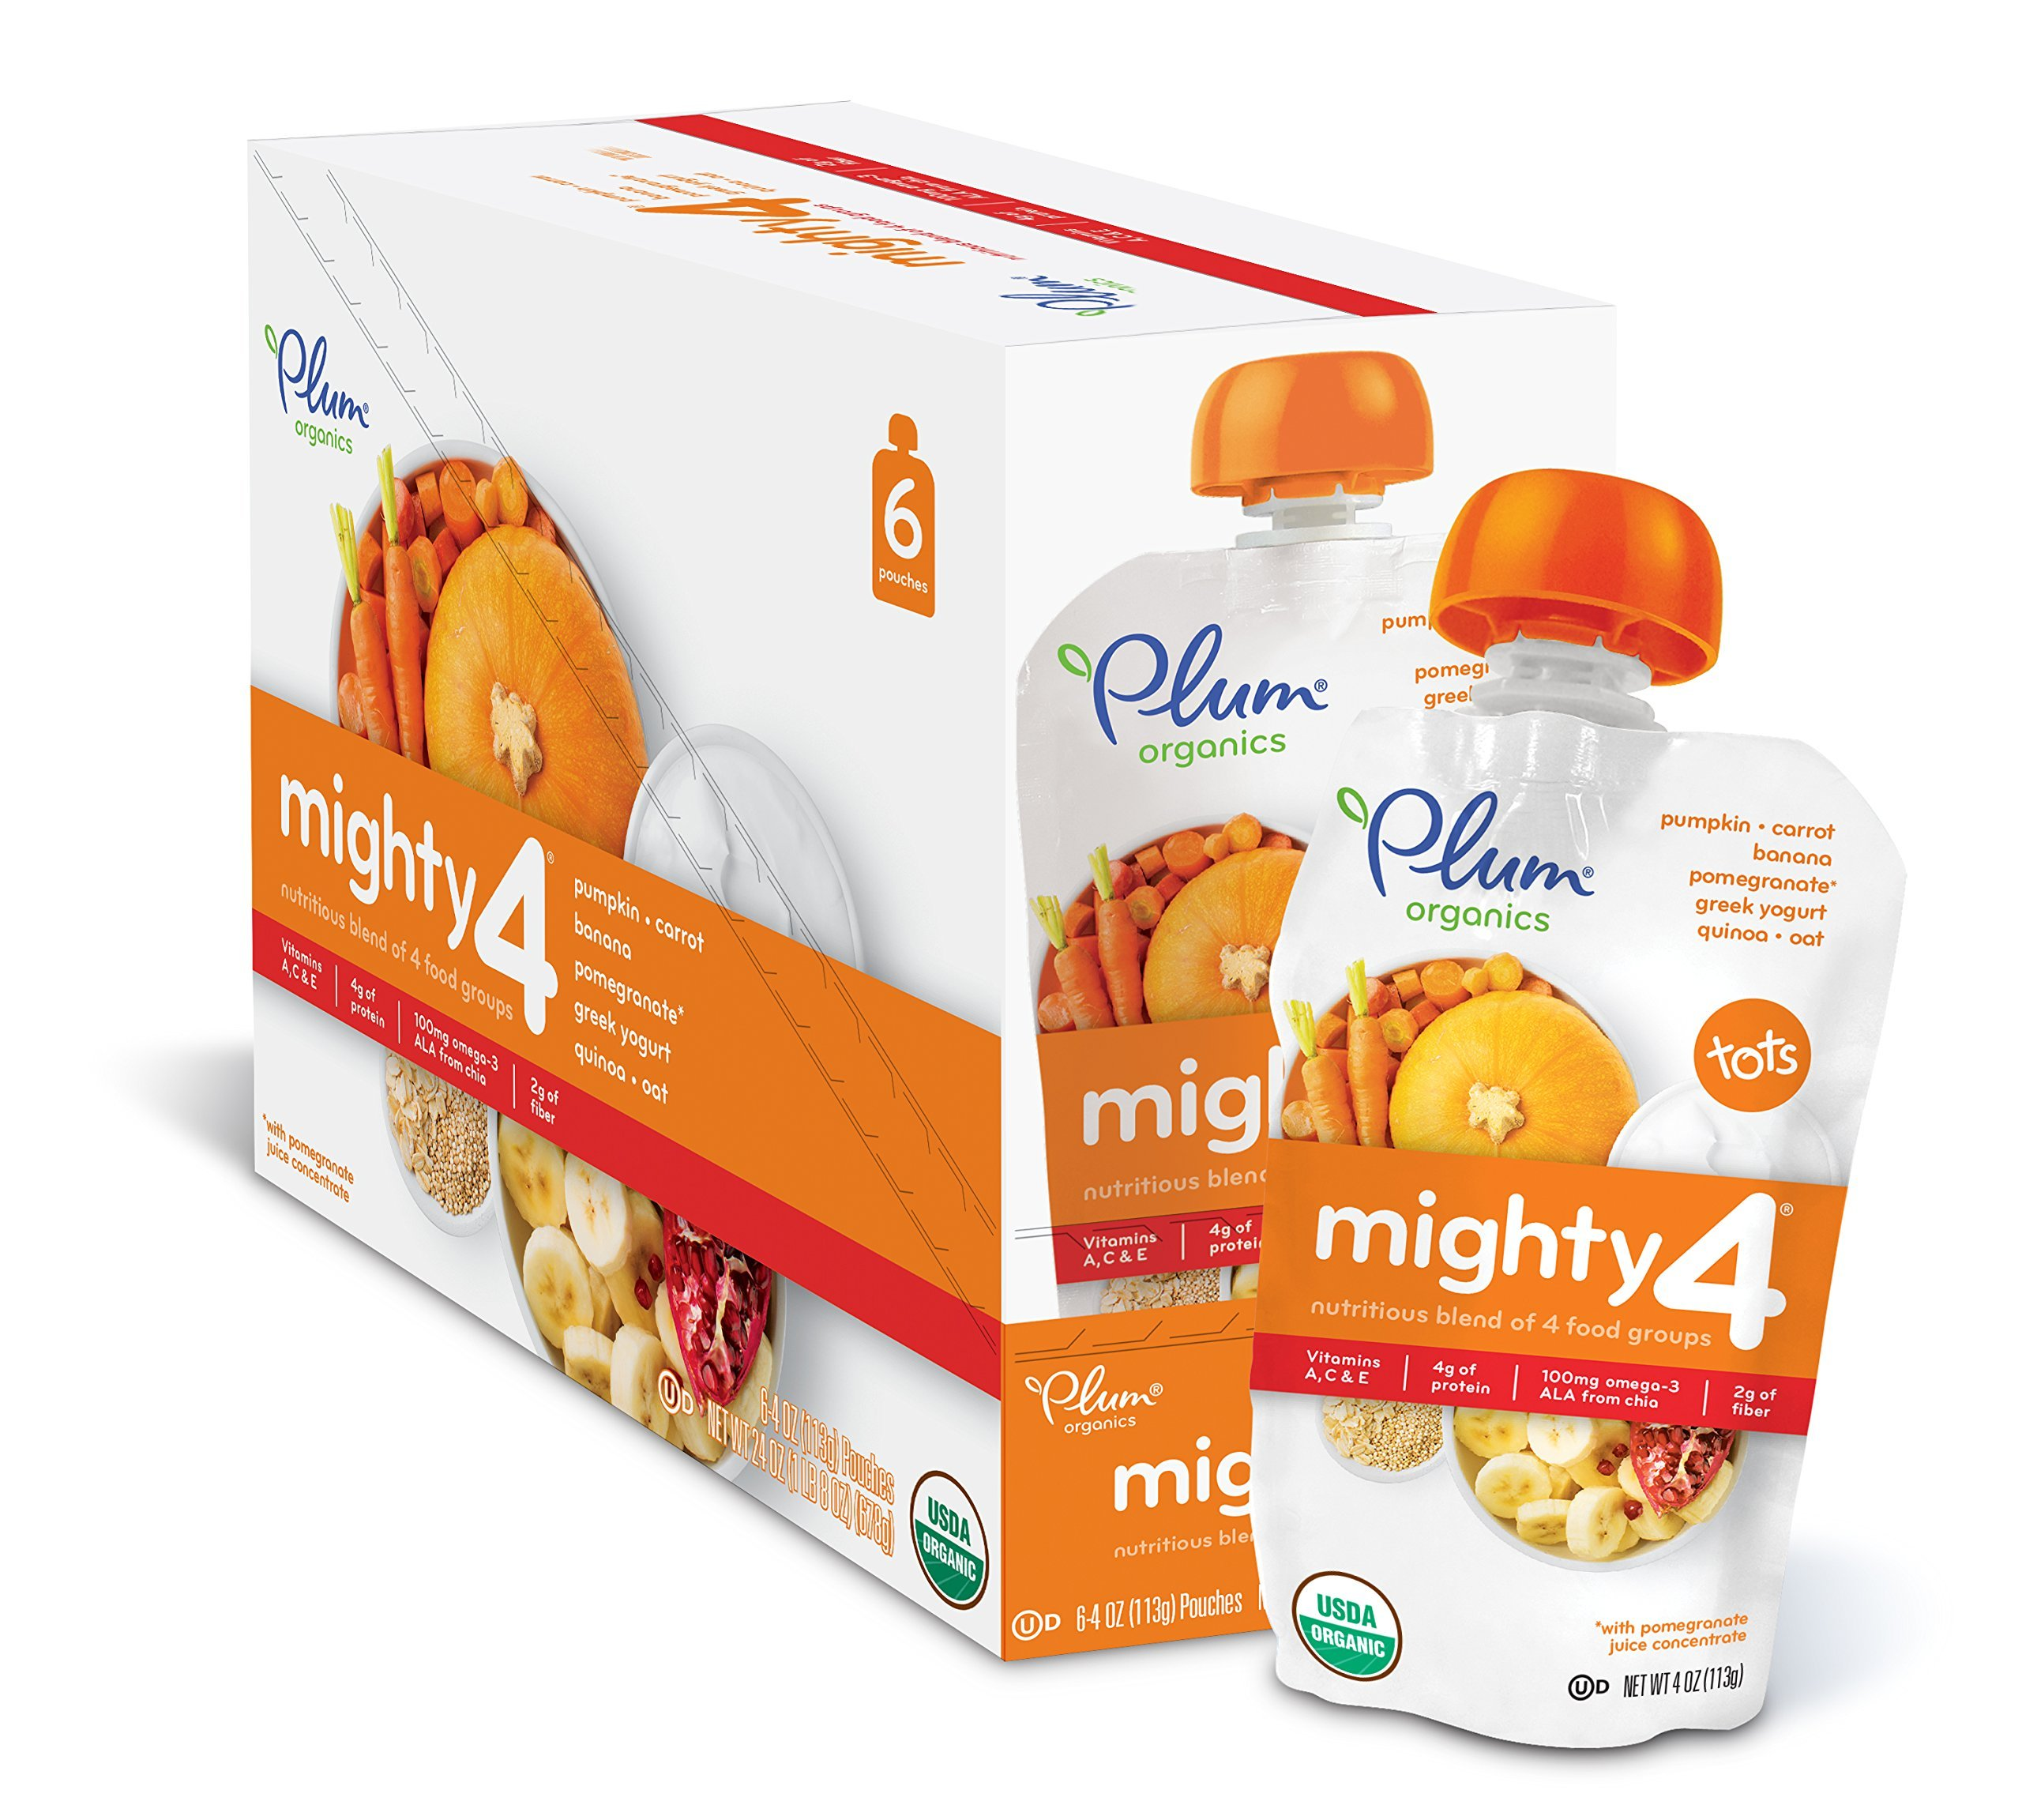 Plum Organics Mighty 4, Organic Toddler Food, Pumpkin, Carrot, Banana, Pomegranate, Greek Yogurt, Quinoa & Oat, 4 oz. pouch (Pack of 12)